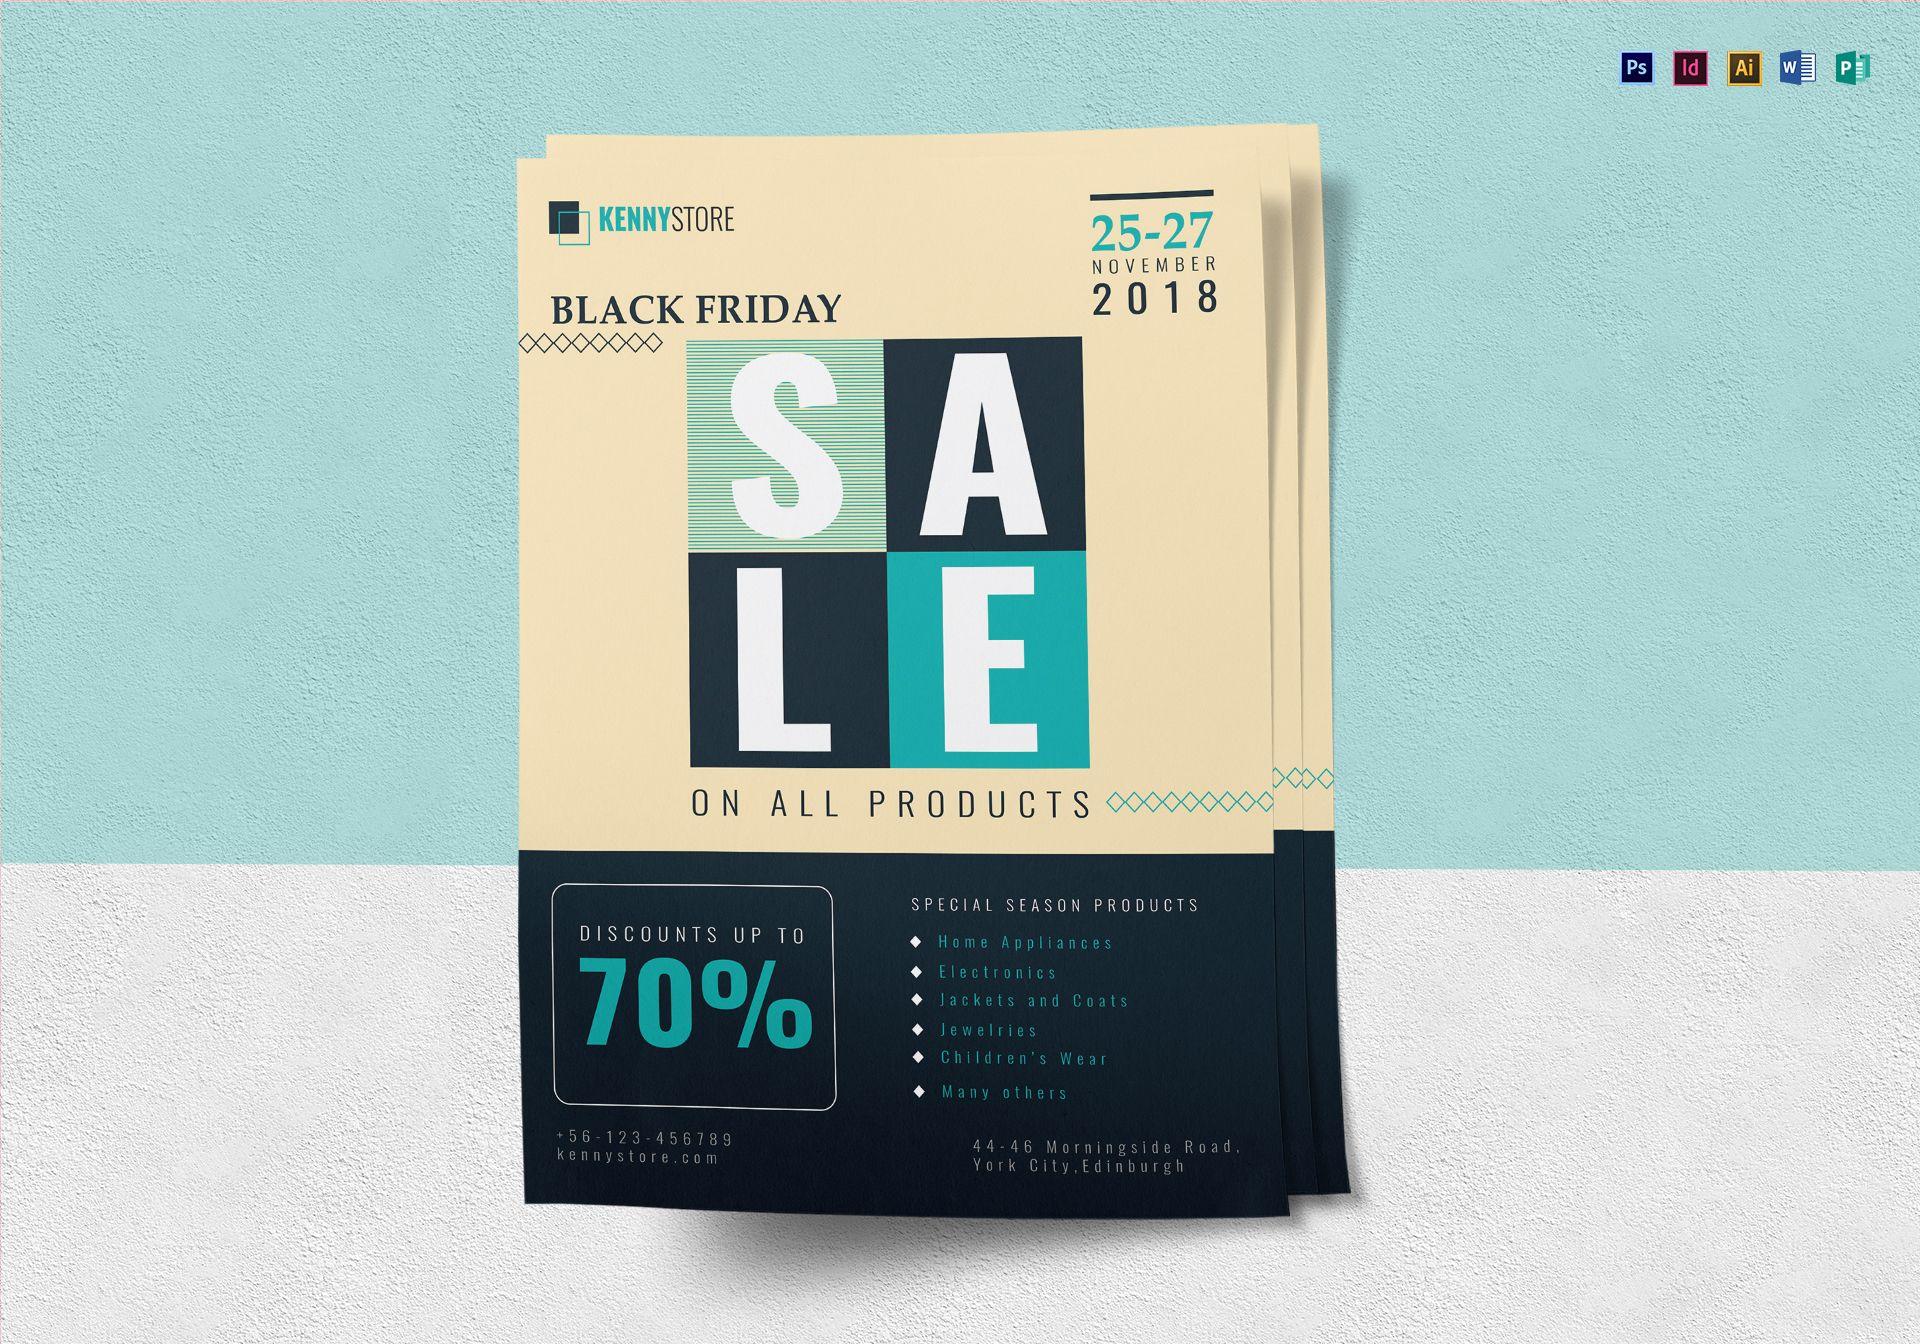 black friday big sale flyer design template in psd word publisher